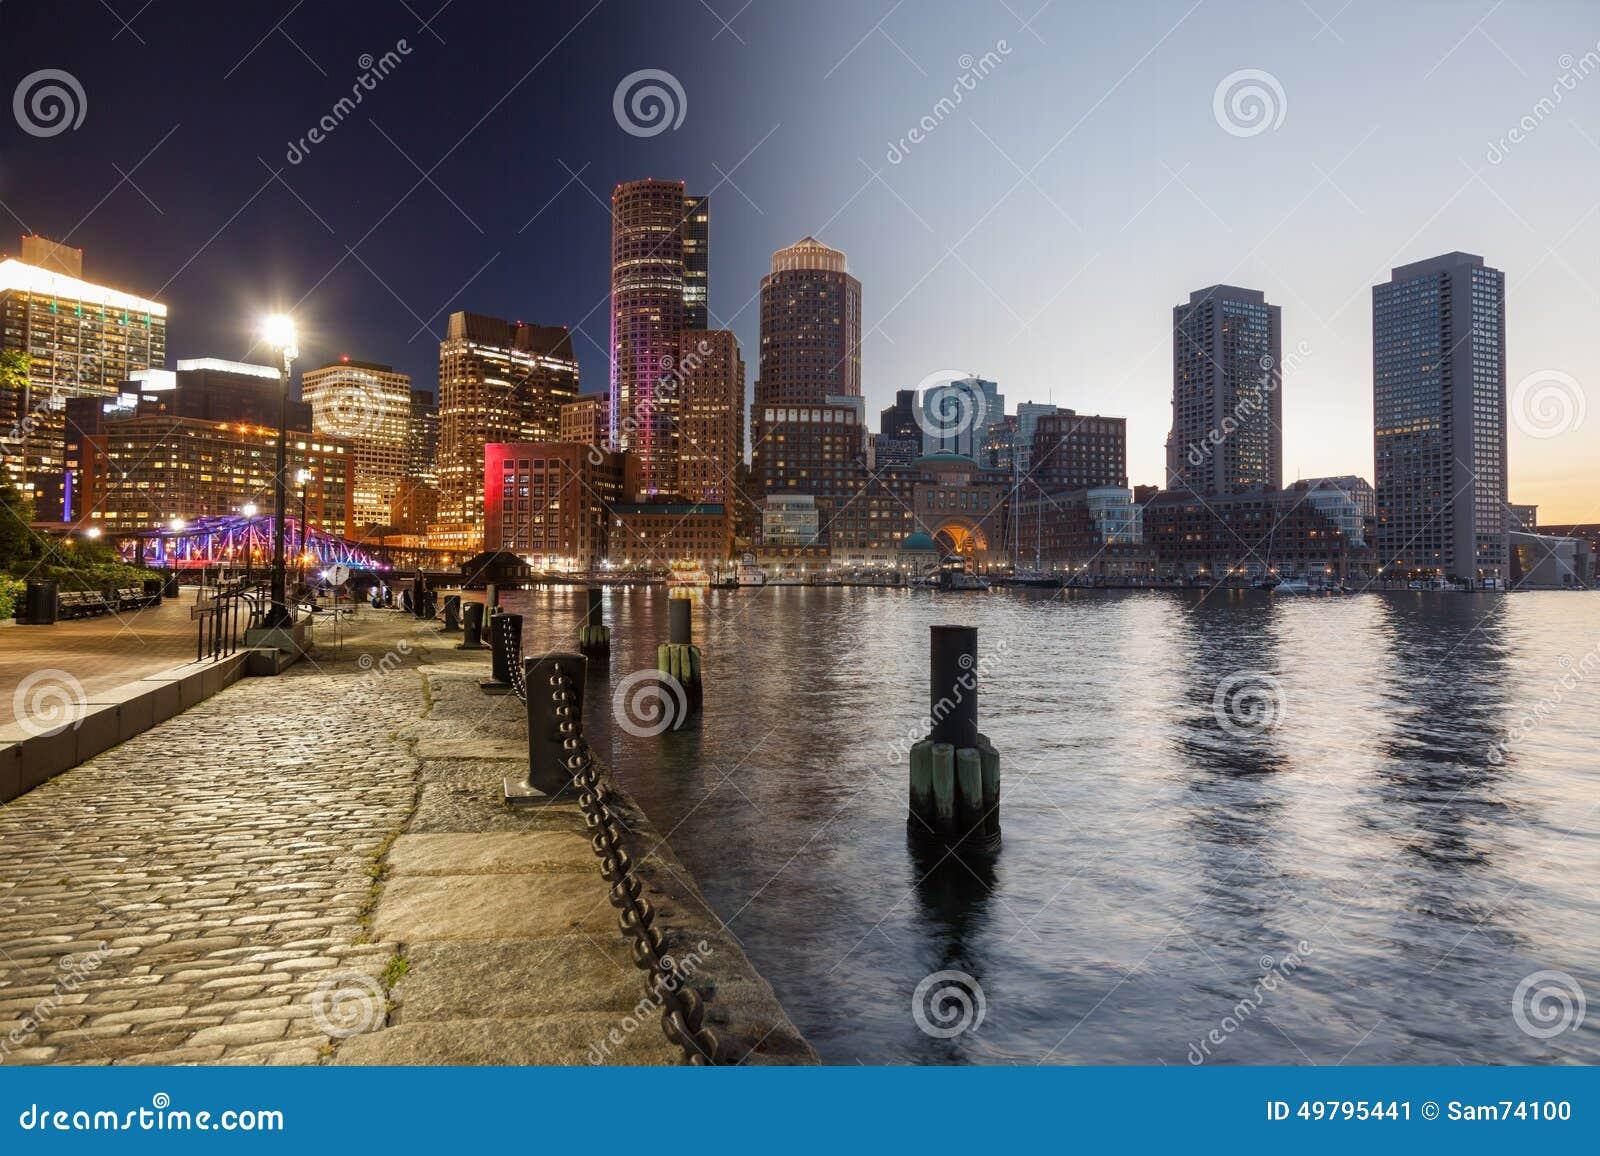 Día del horizonte de Boston al montaje de la noche - Massachusetts - los E.E.U.U. - unidad